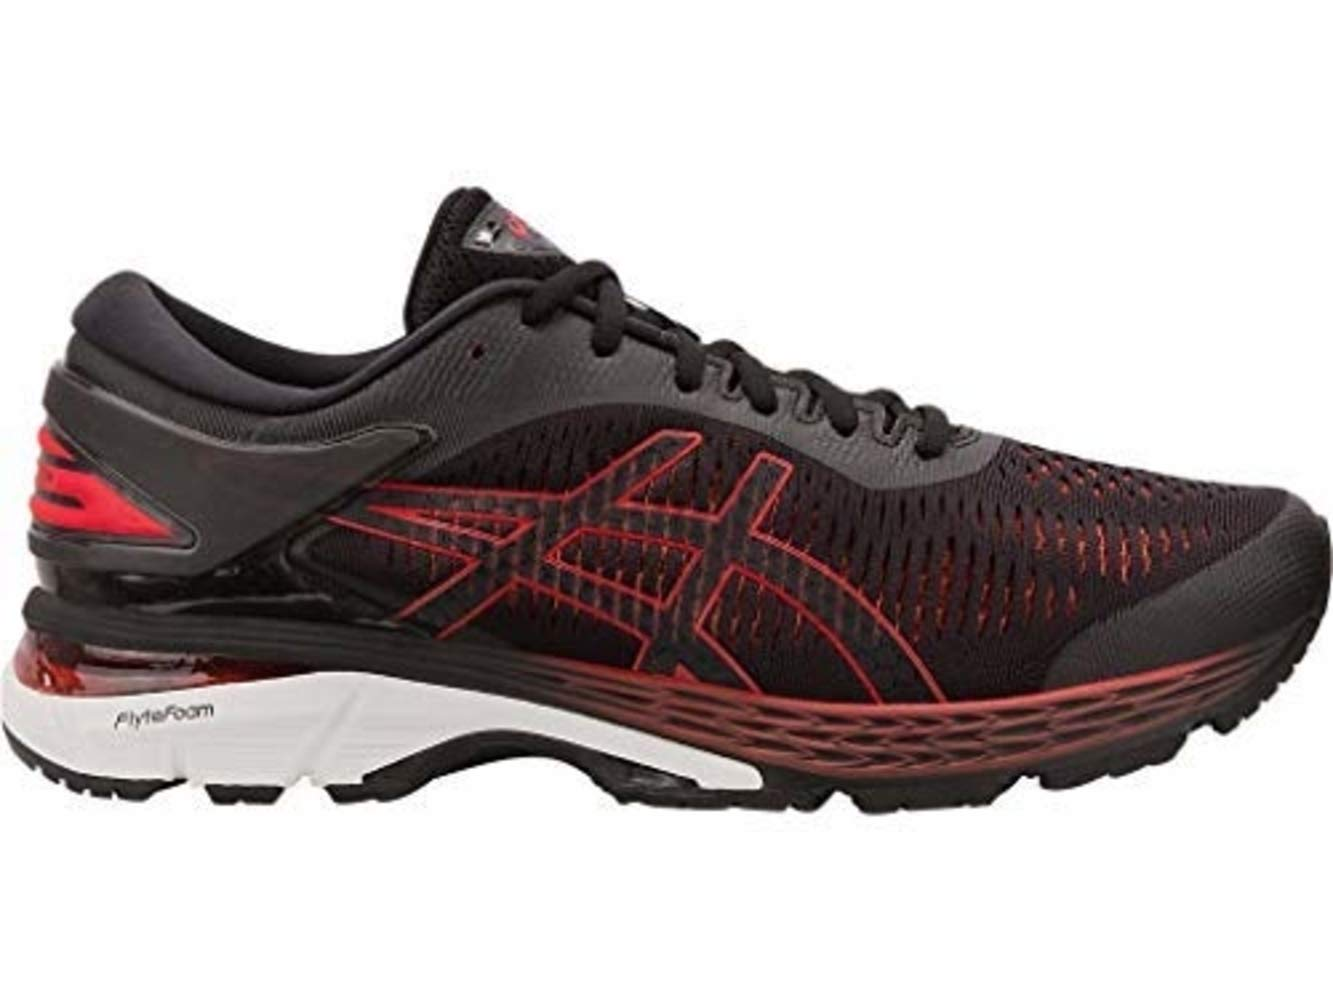 ASICS Gel-Kayano 25 Men's Running Shoe, Black/Classic Red, 13 D US